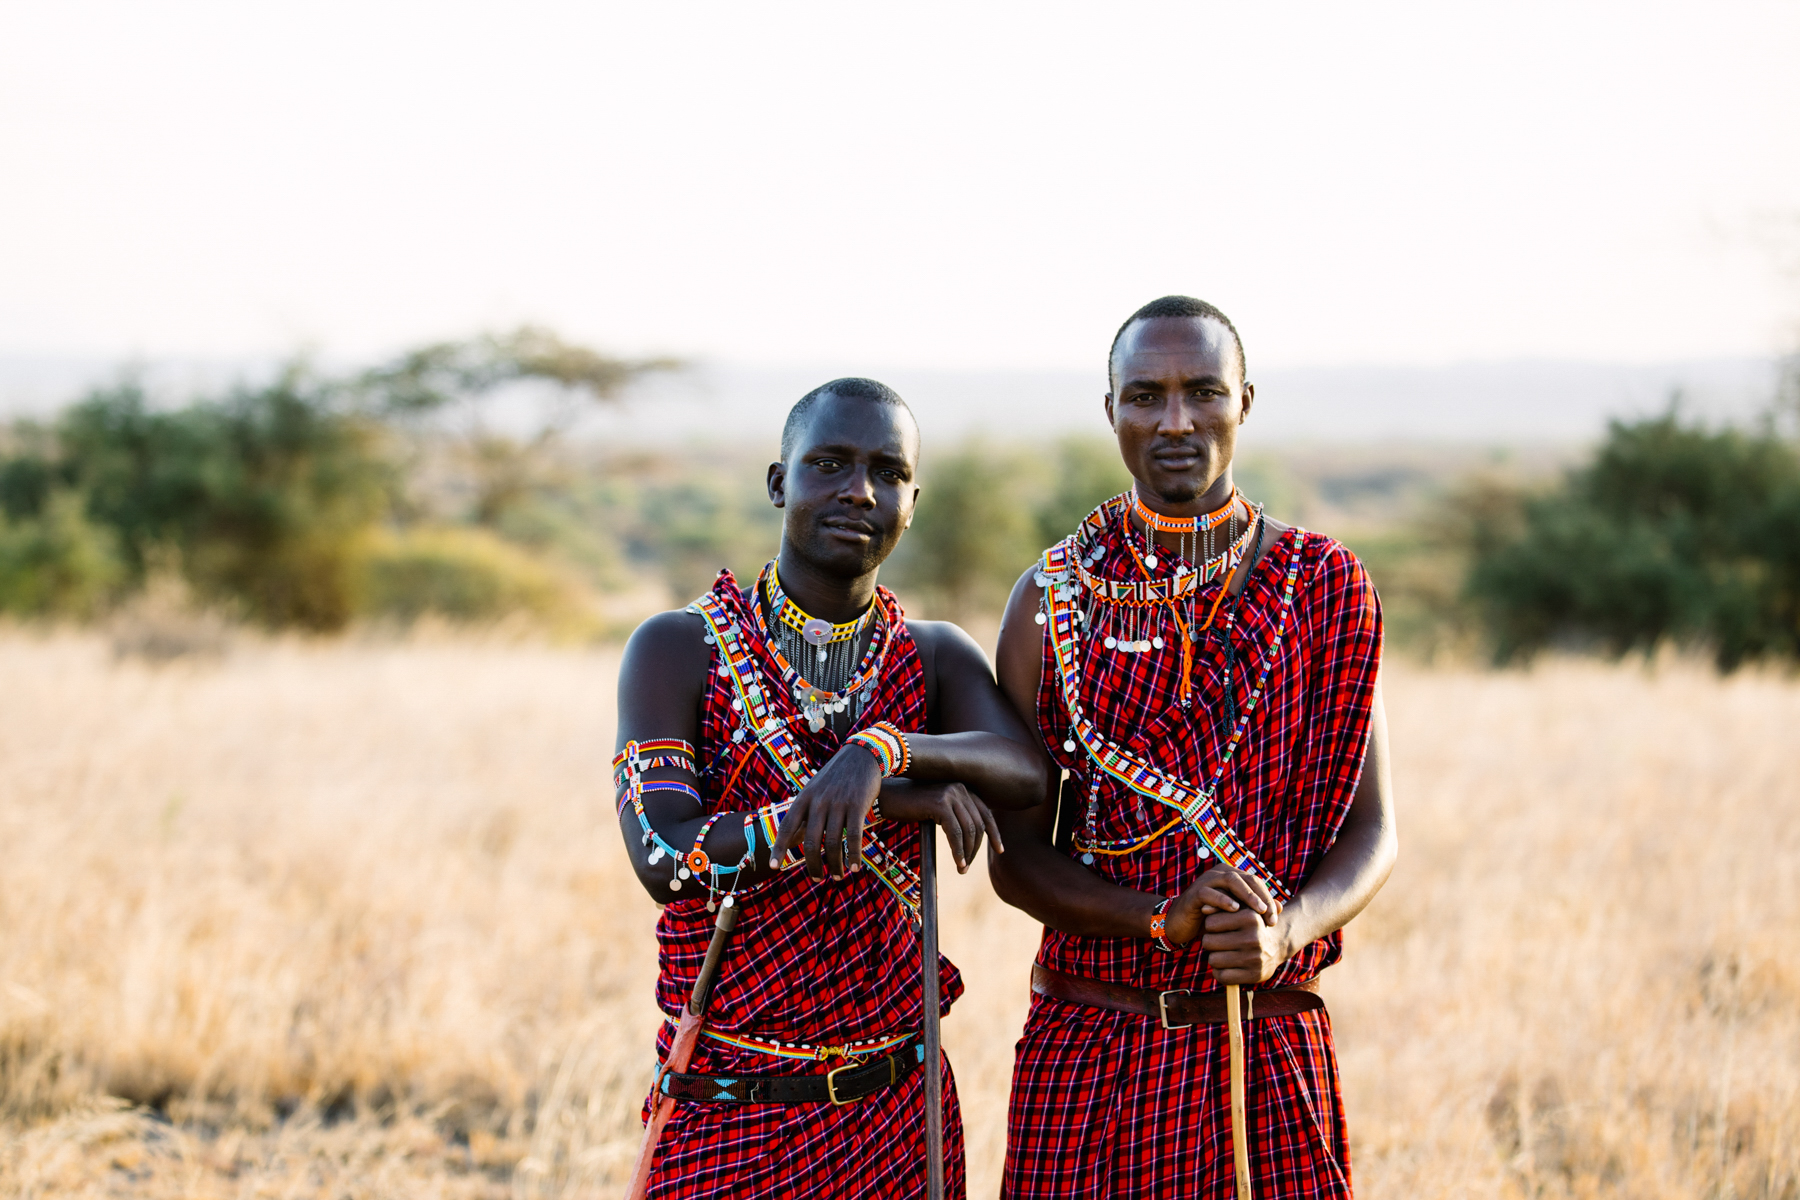 KenyaFeb2019_Safari-9.jpg